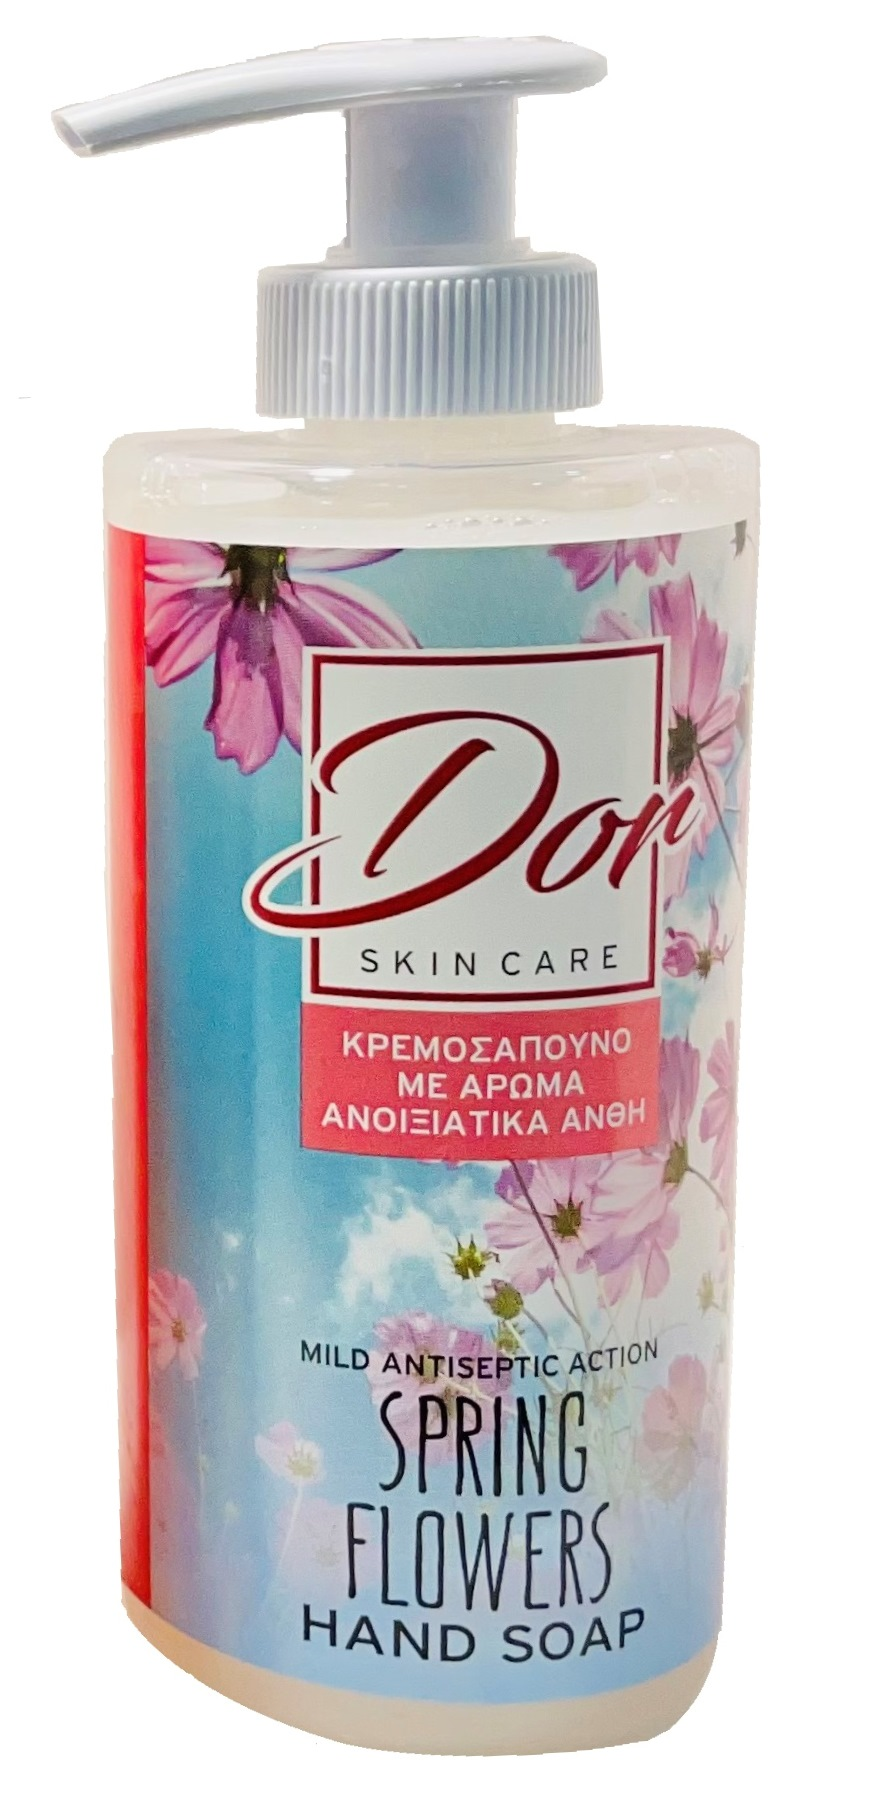 DOR HAND SOAP FLORAL ANTICEPTIC 300ML